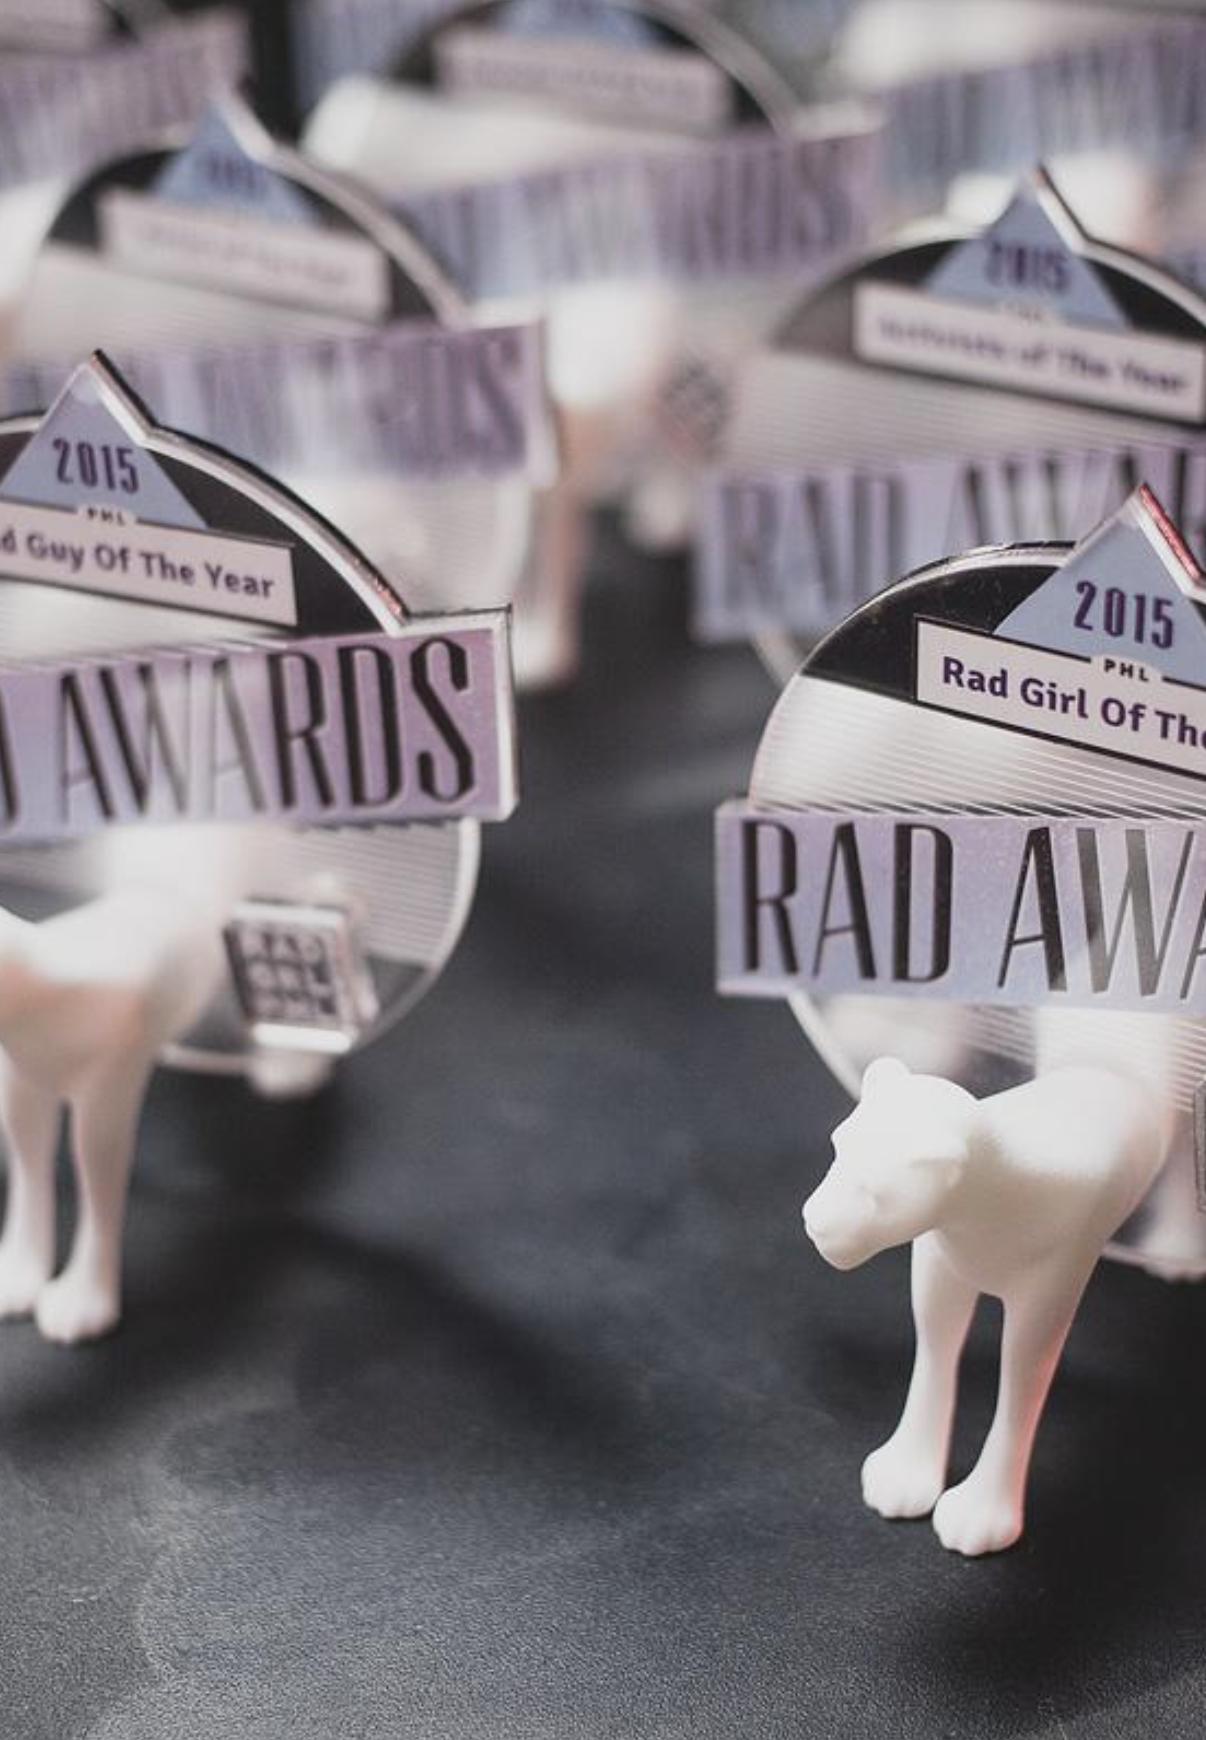 Denise Fike Rad Awards Nominee